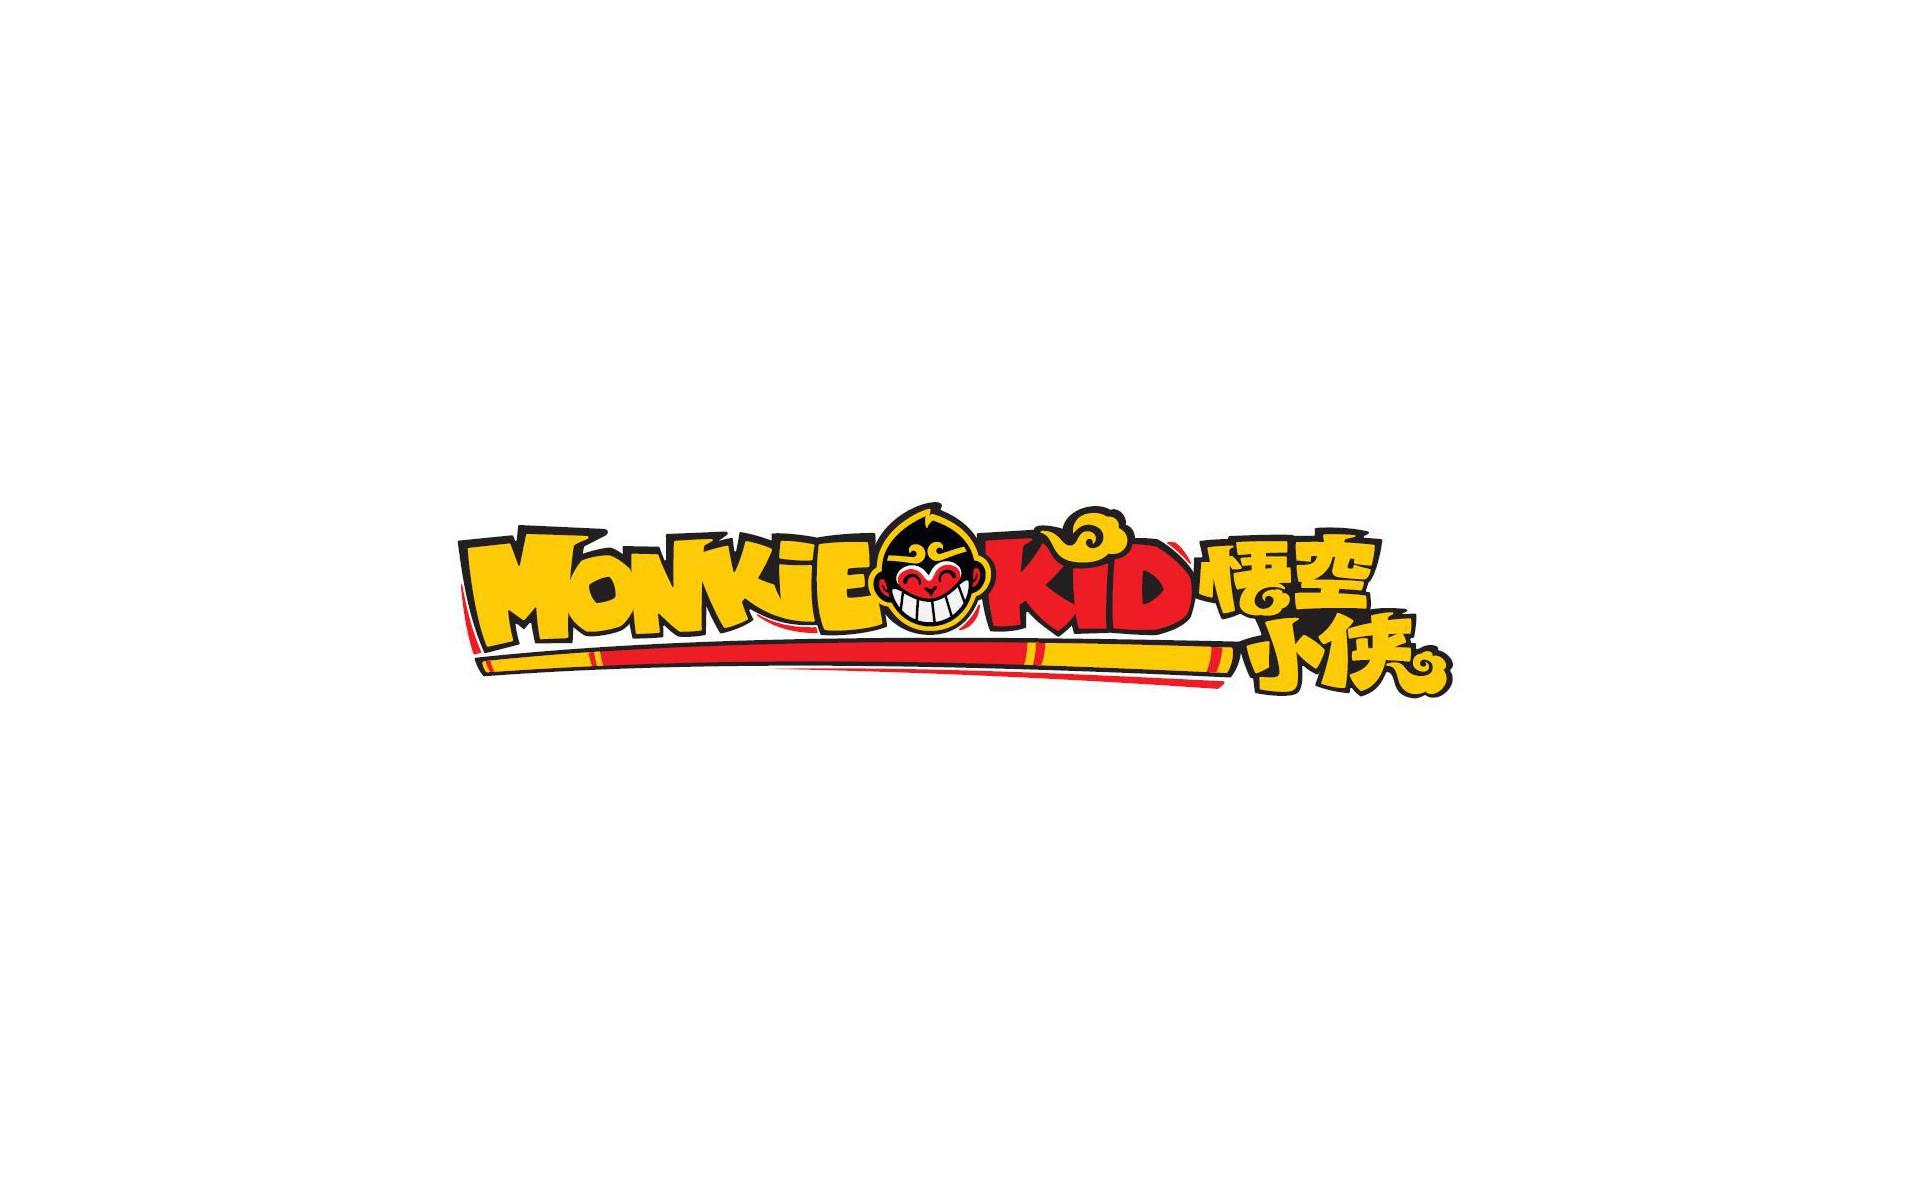 The Monkey - Le grandi avventure di Goku